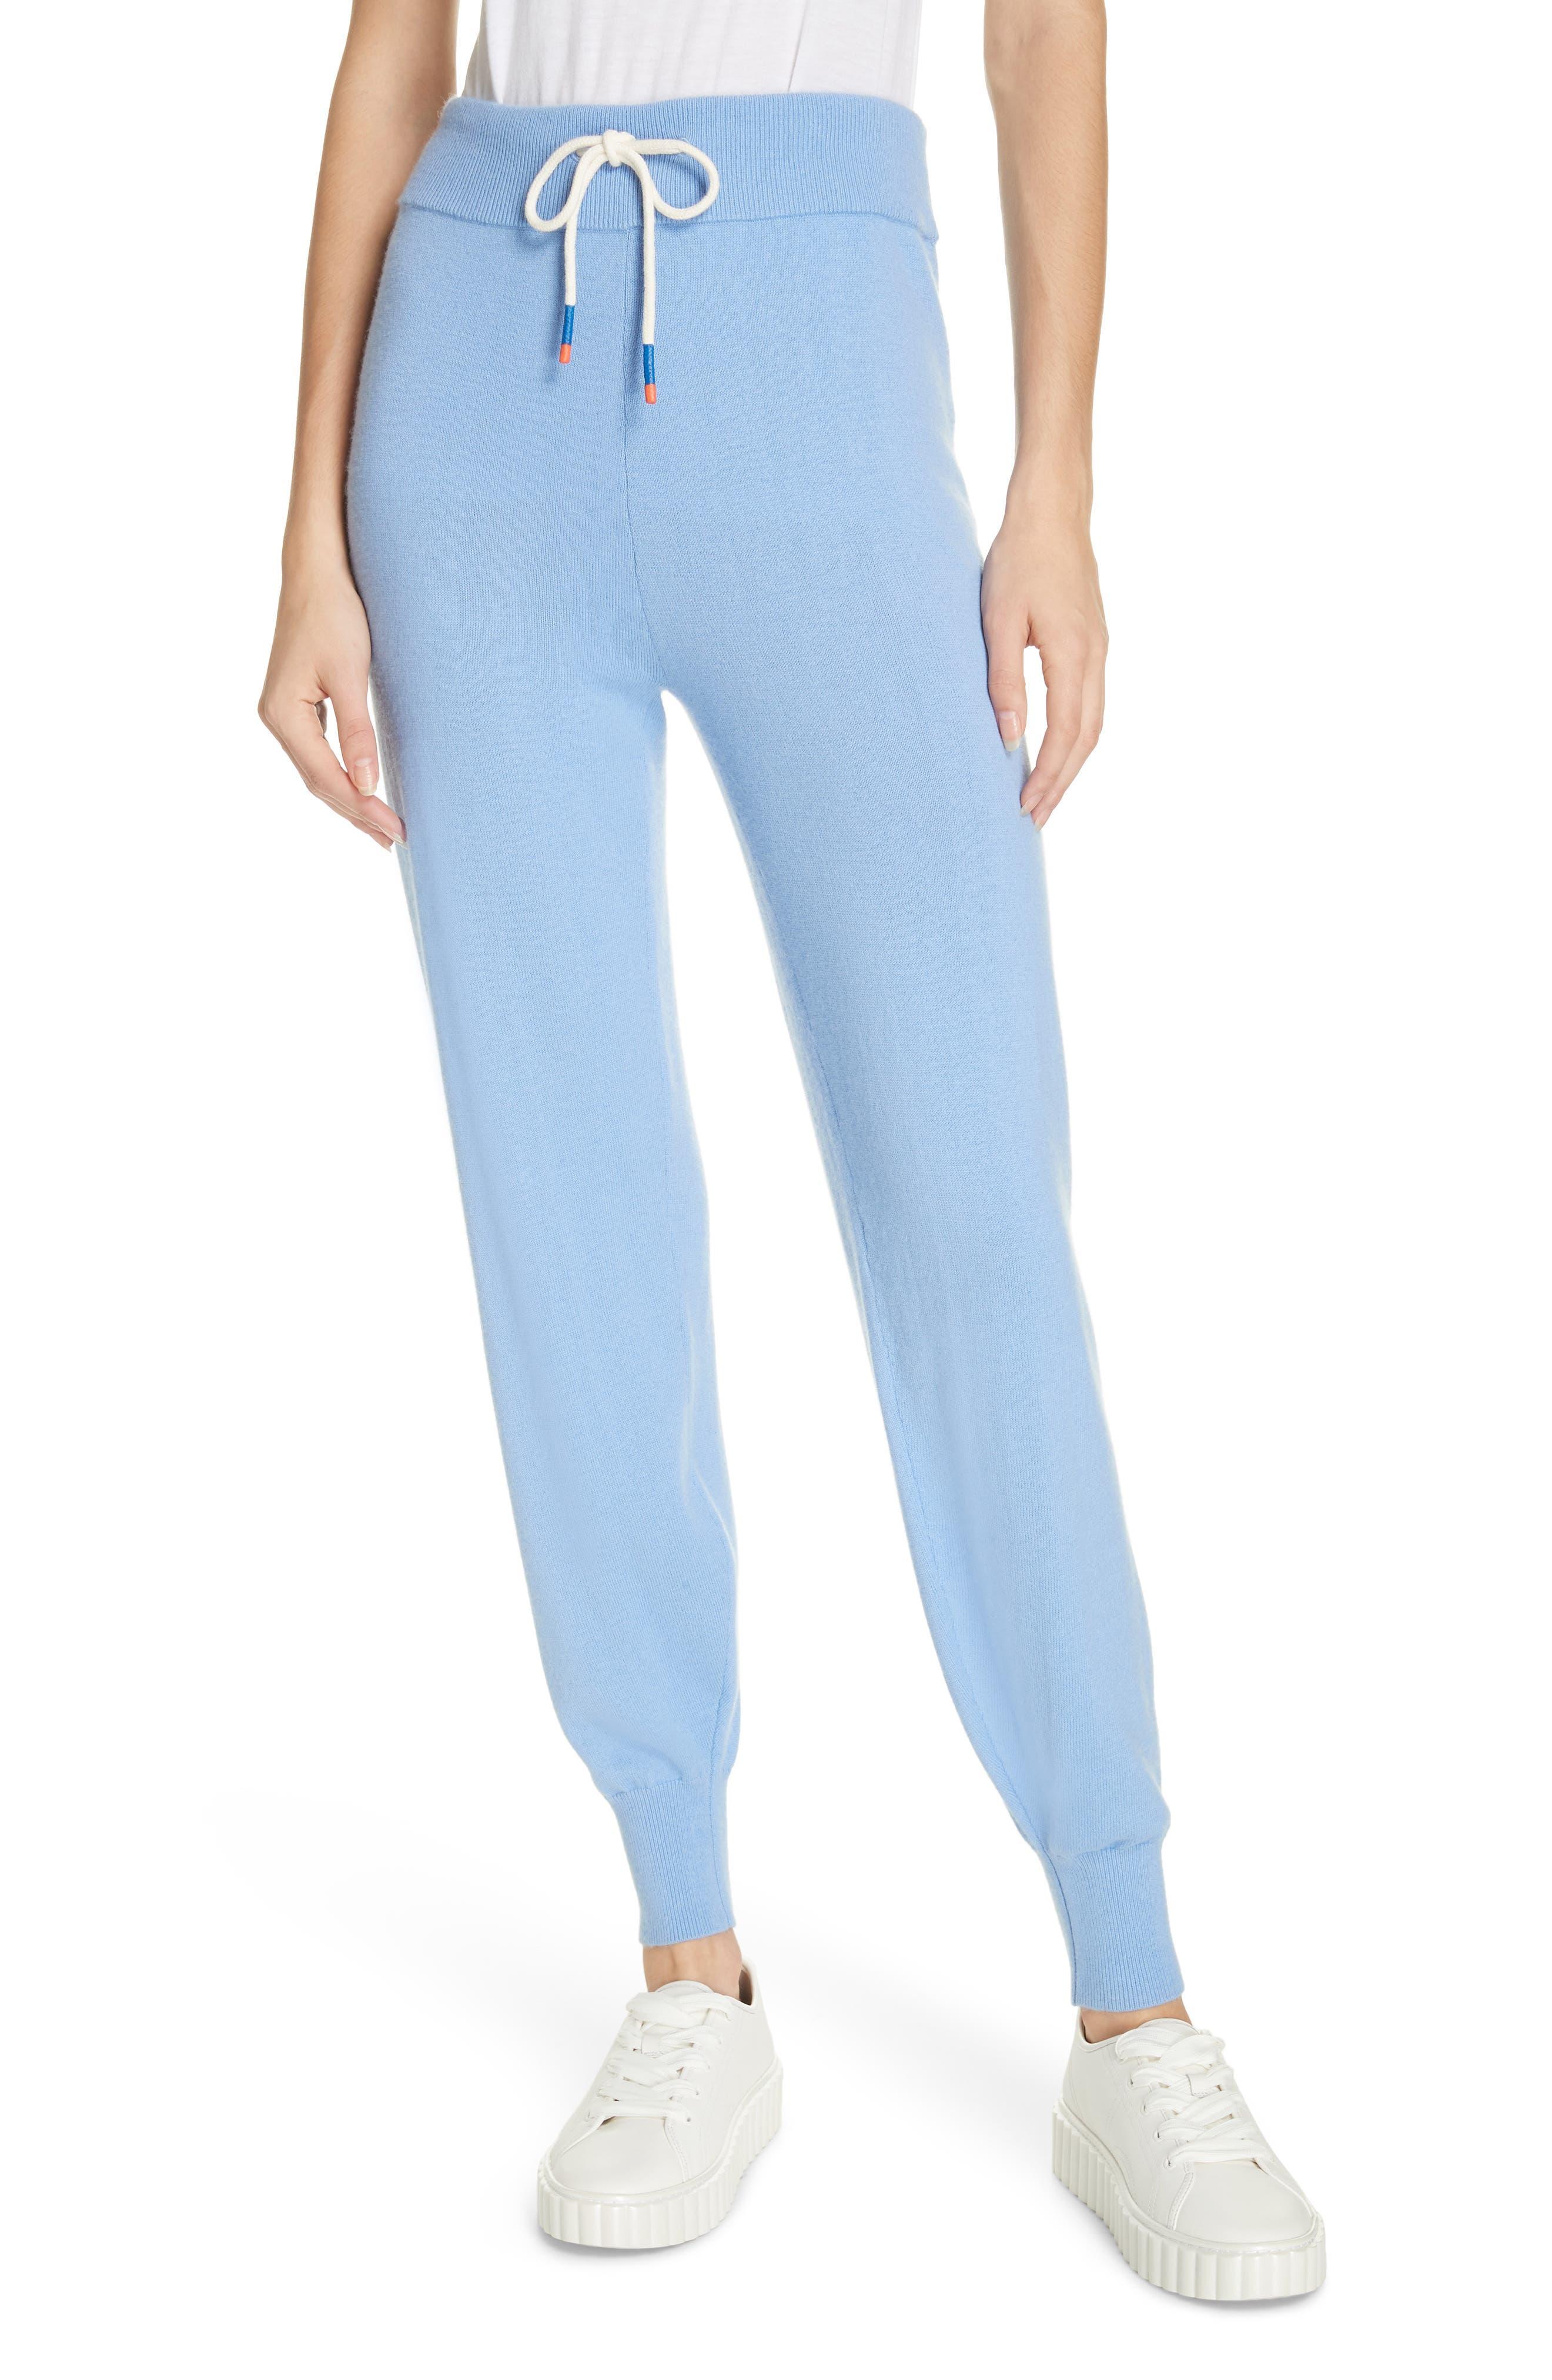 Tory Sport Performance Cashmere Blend Lounge Pants, Blue